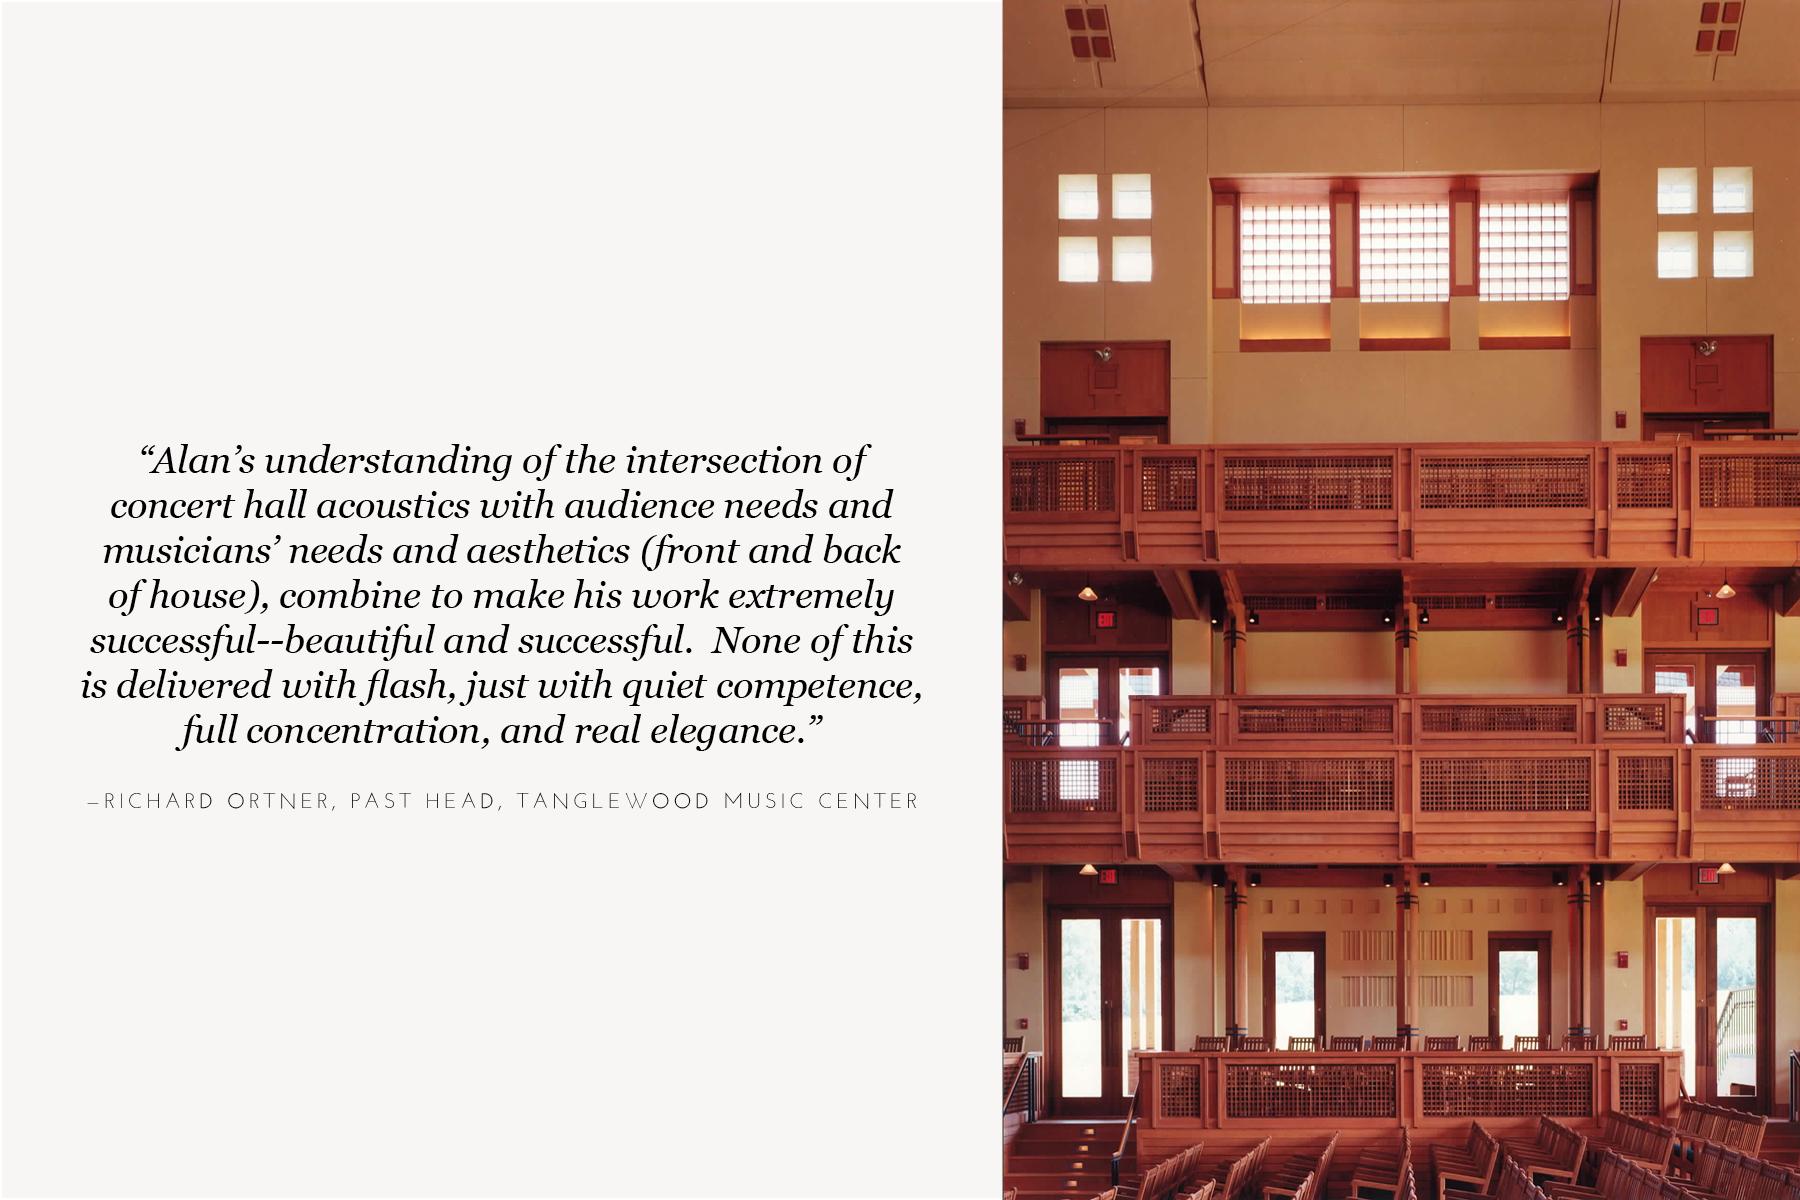 Tanglewood-Ozawa-Hall-Alan-Joslin-08.jpg